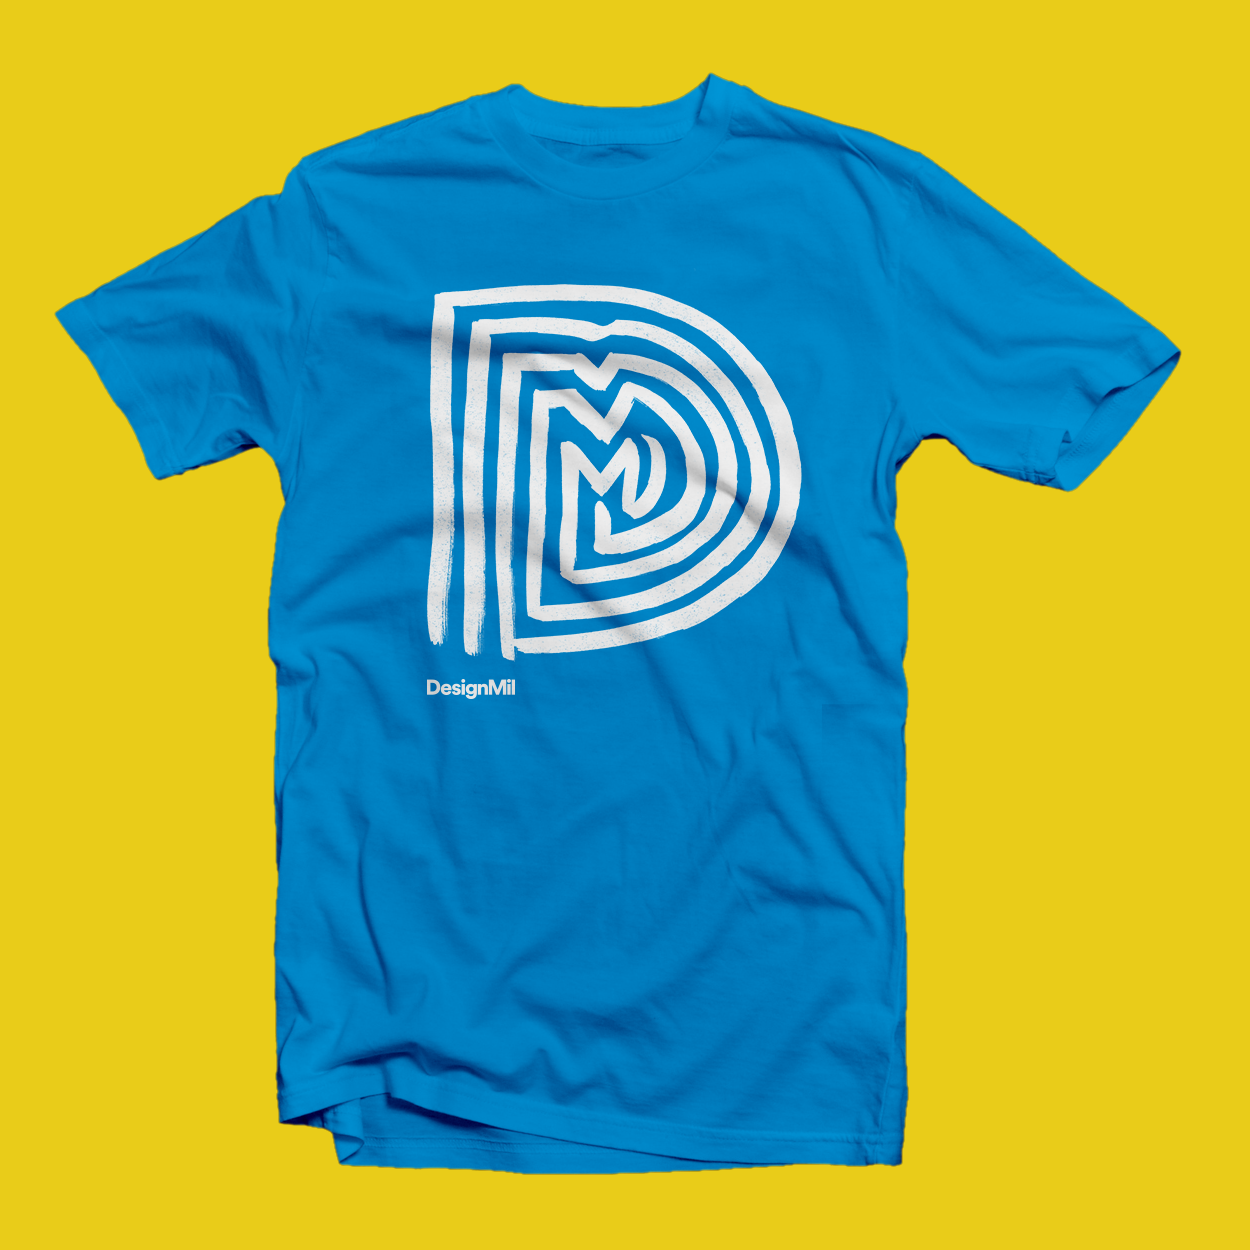 DesignMil_Tshirt_Mockup.png